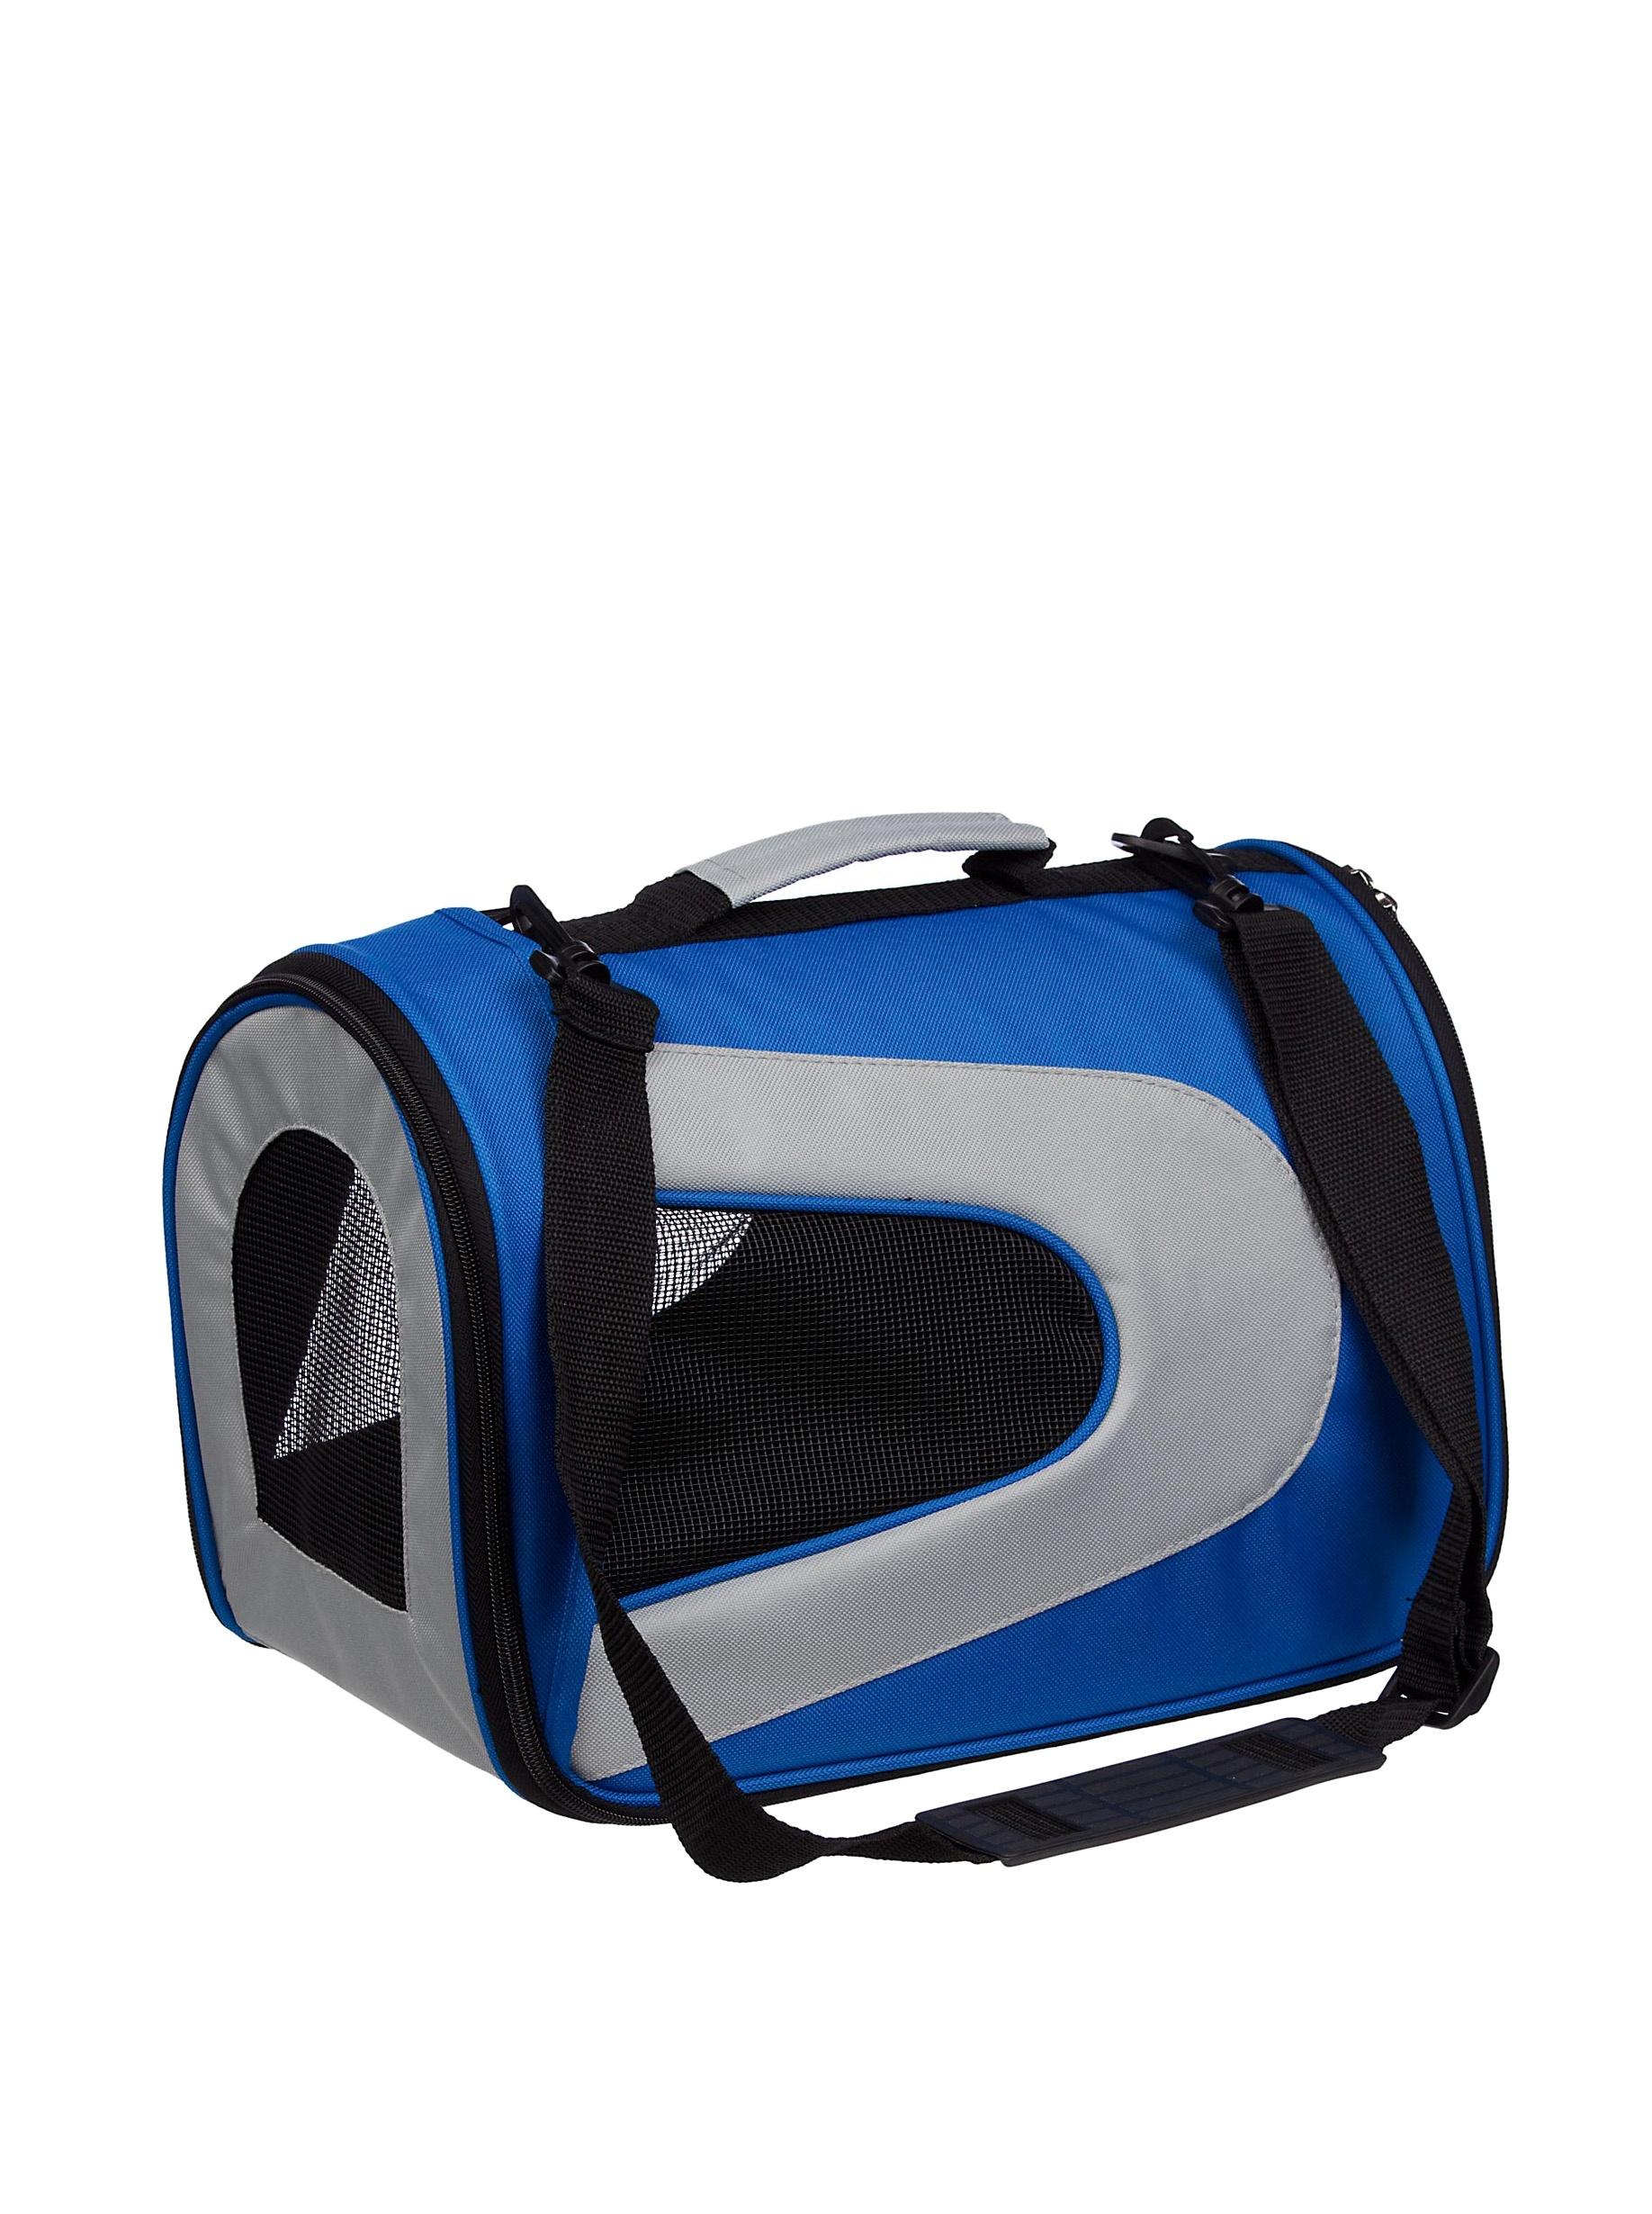 Pet Life Sporty Mesh Carrier (Blue/Grey)